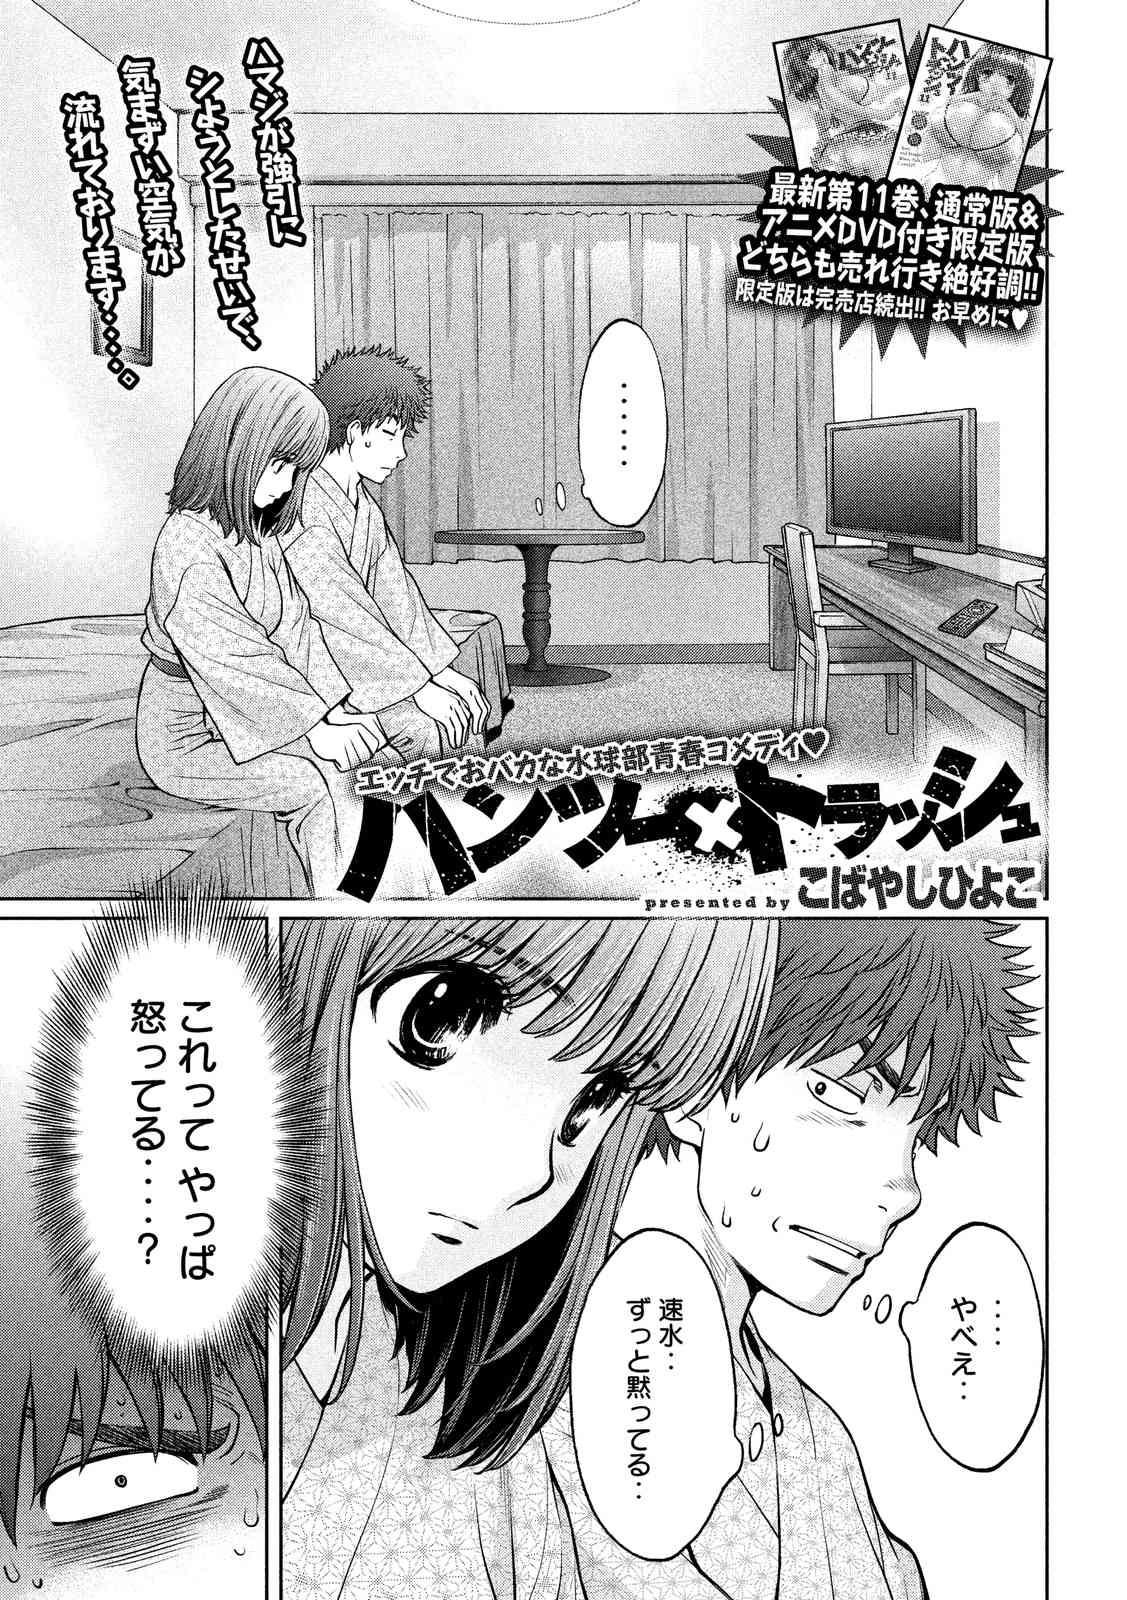 Hantsu_x_Trash Chapter 130 Page 1